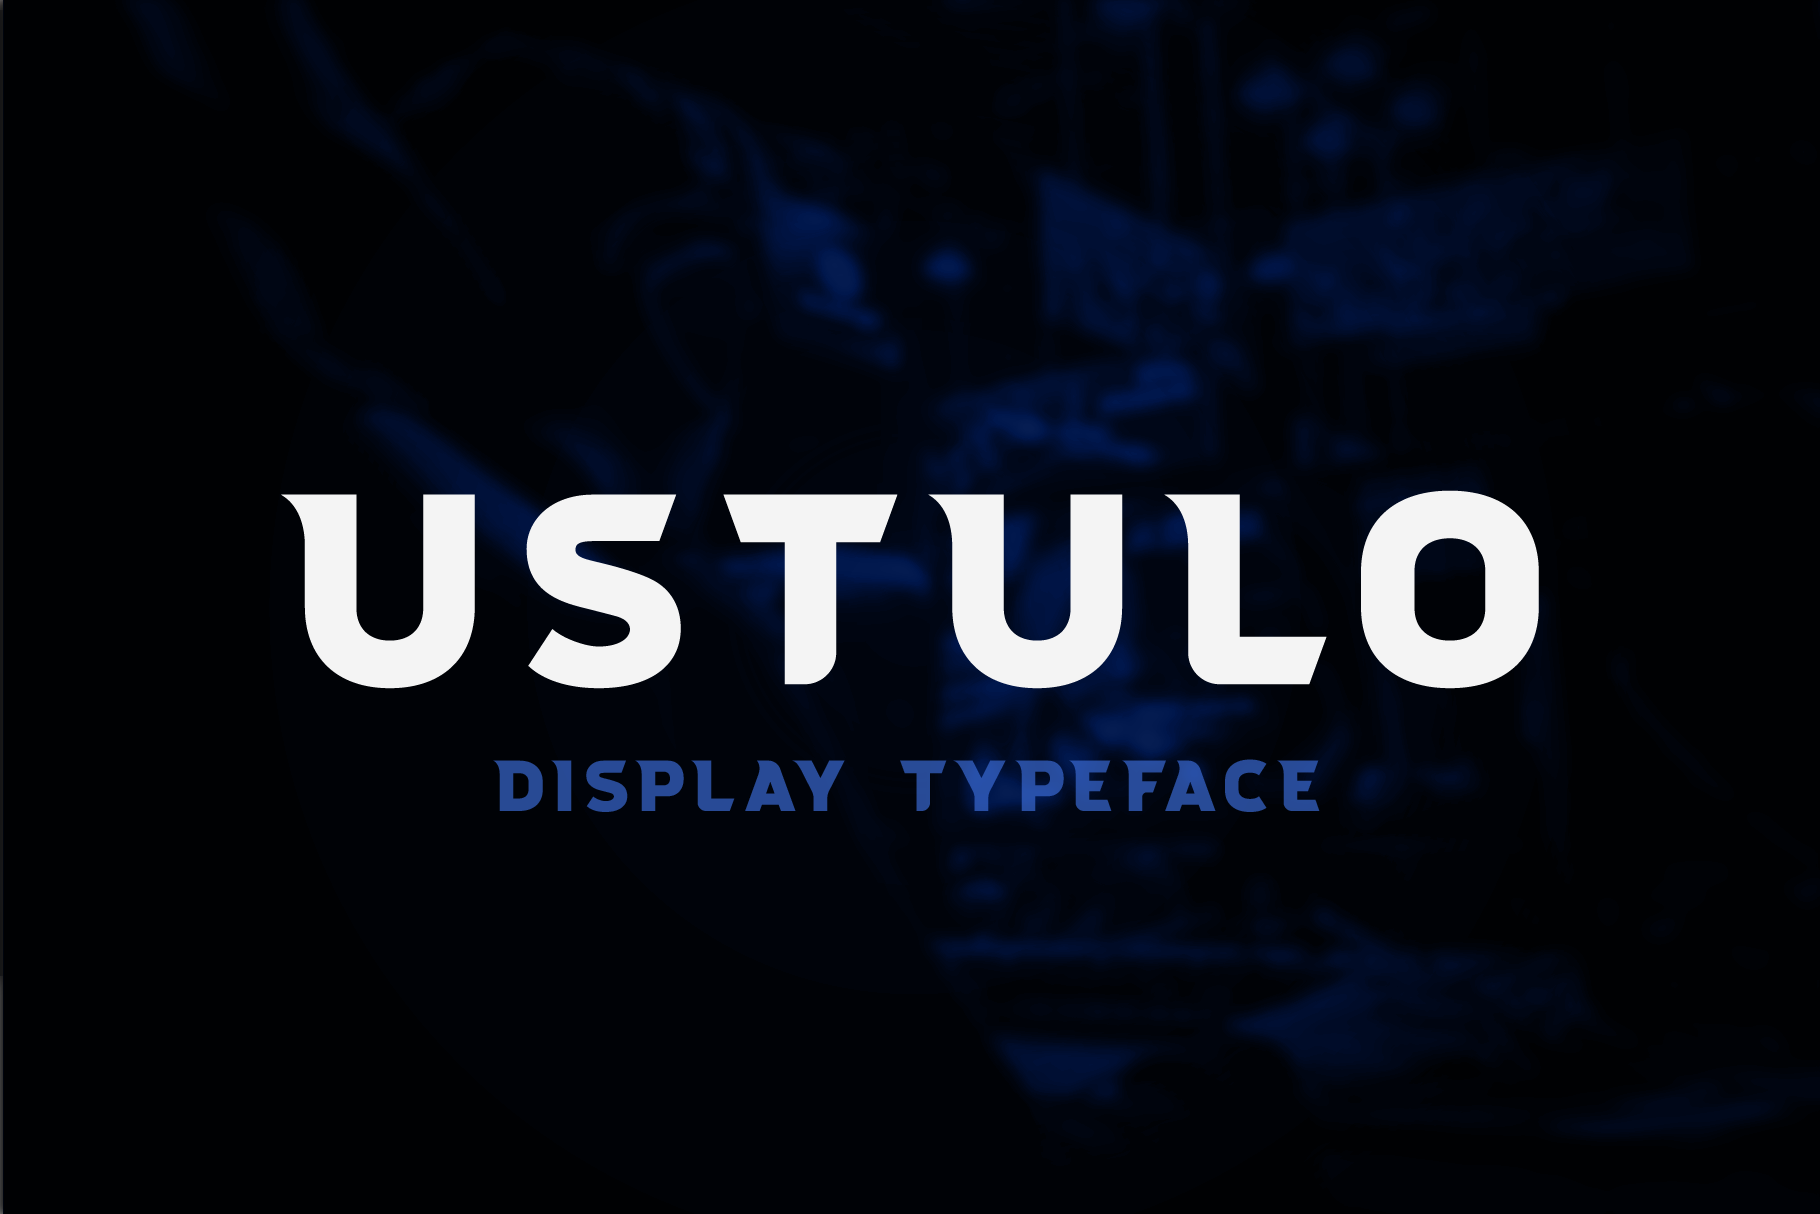 Ustulo Display Typeface